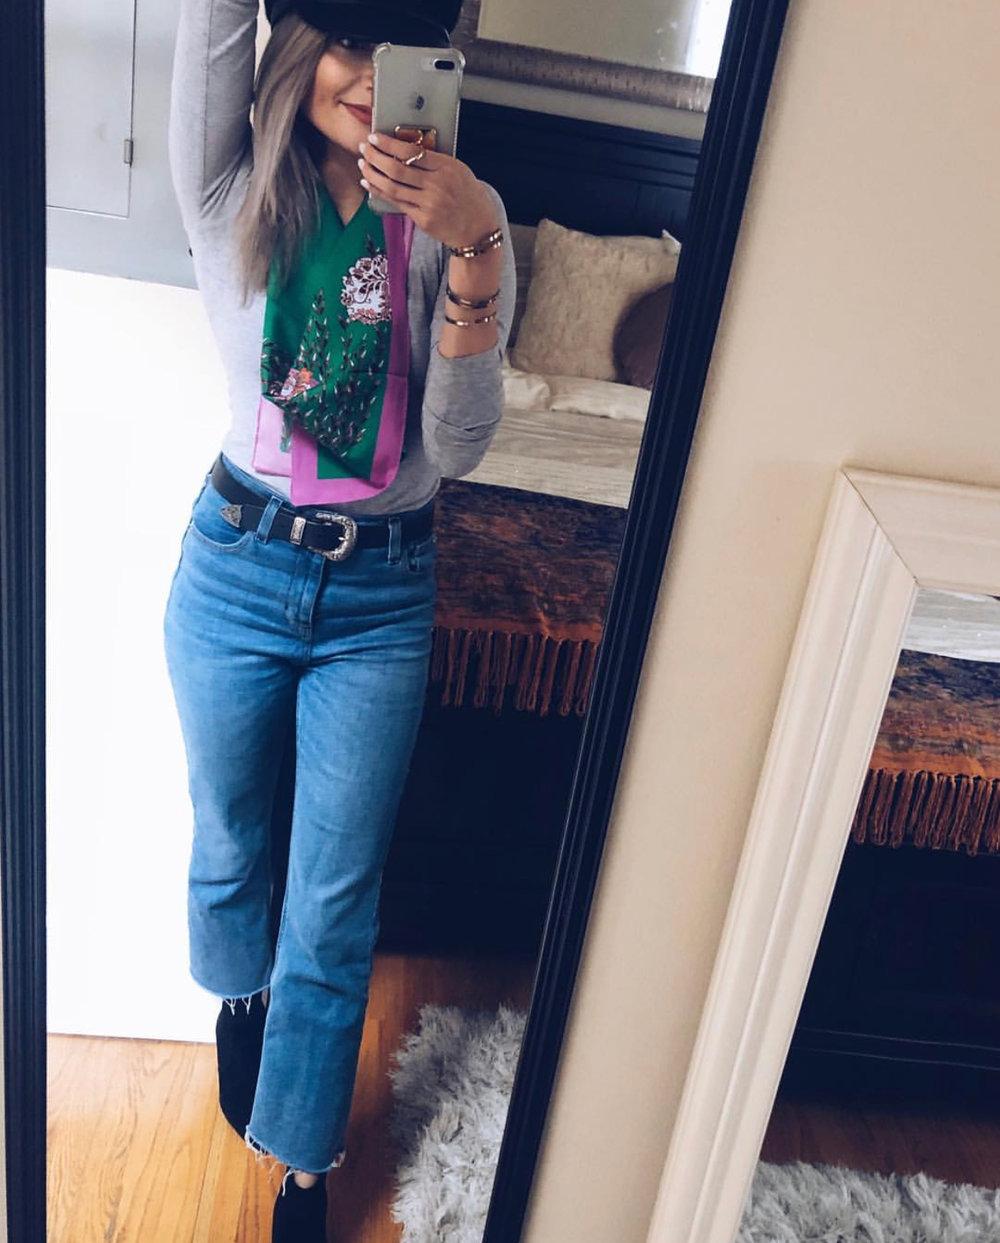 Recreate the Look: - Hat: BCBGScarf: Urban OutfittersShirt: H&MBelt: ASOSJeans: Urban Outfitters